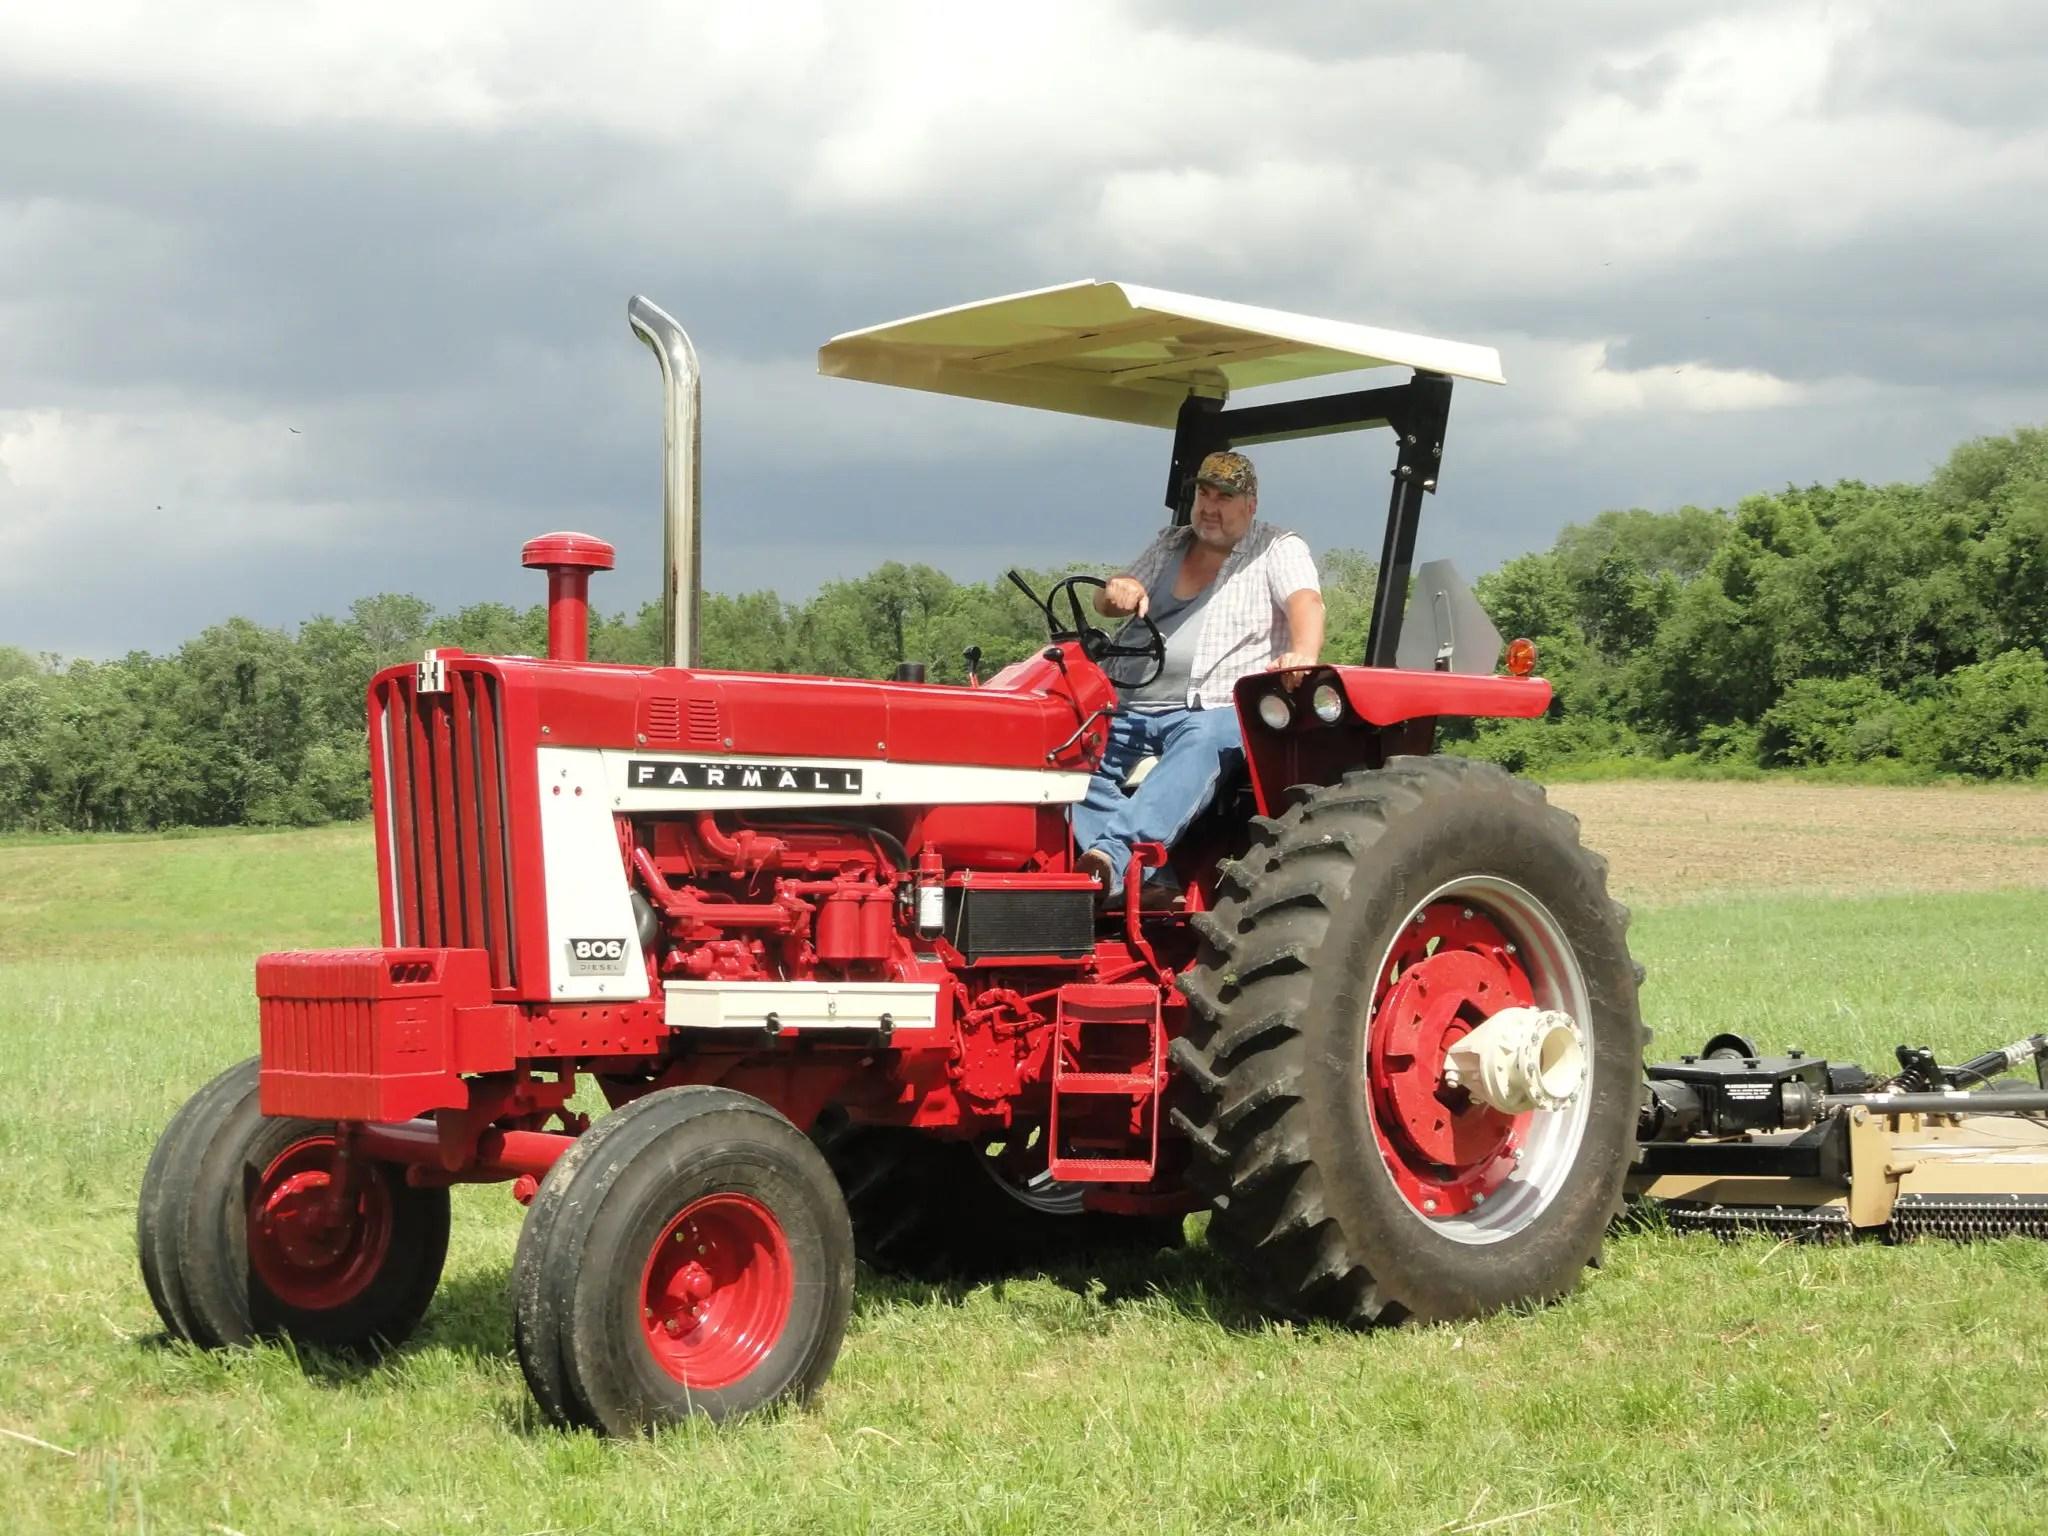 1066 International Tractor Wiring Harness International Economy Hex Axle Iron Bull Mfg